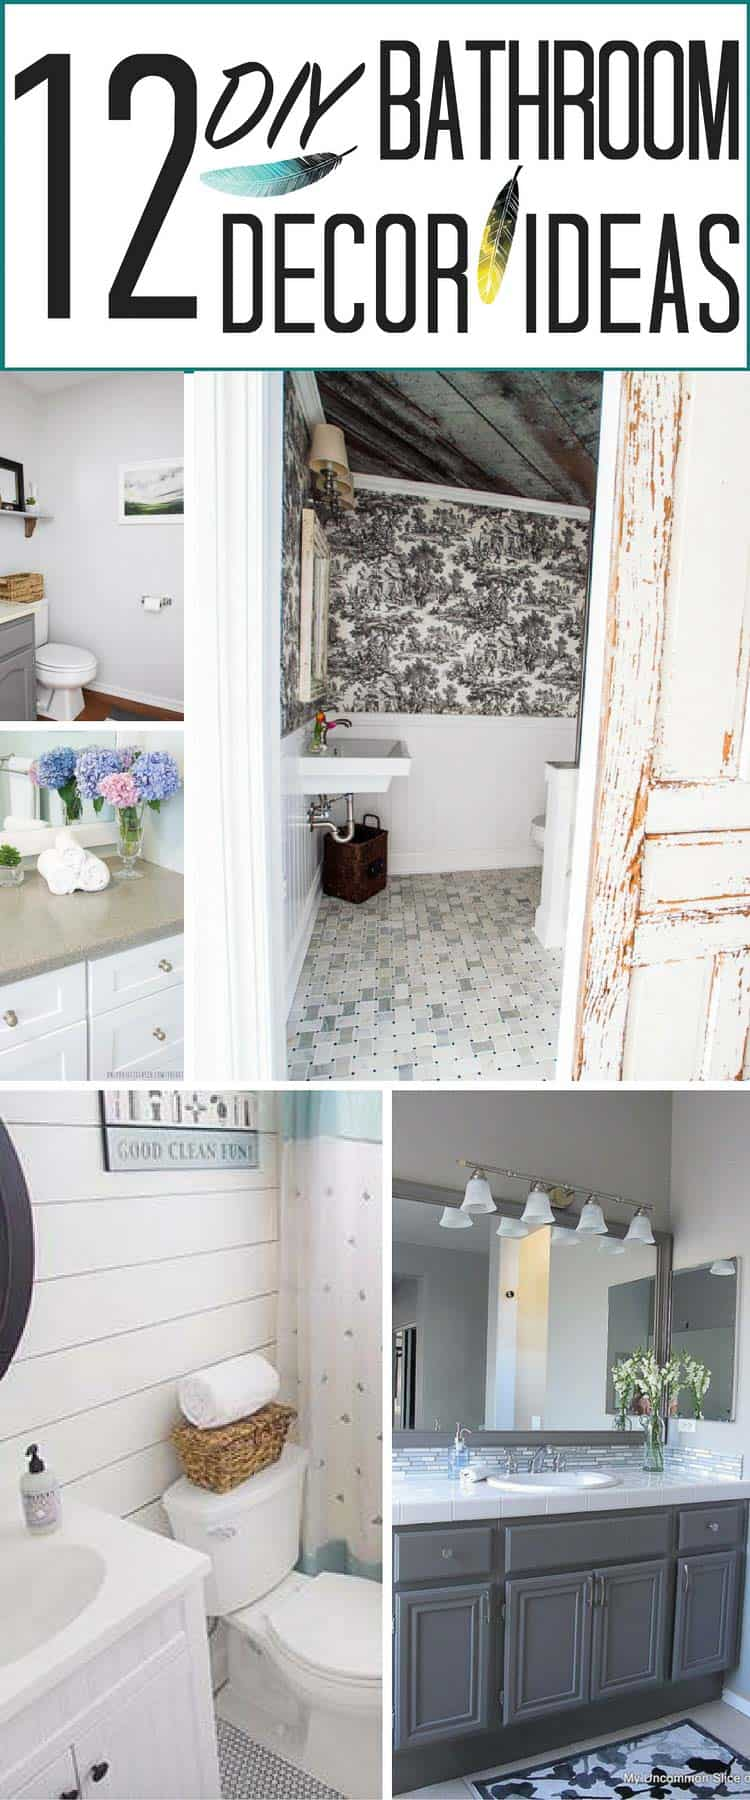 12 Popular DIY Bathroom Decor Ideas From Heatherednest.com